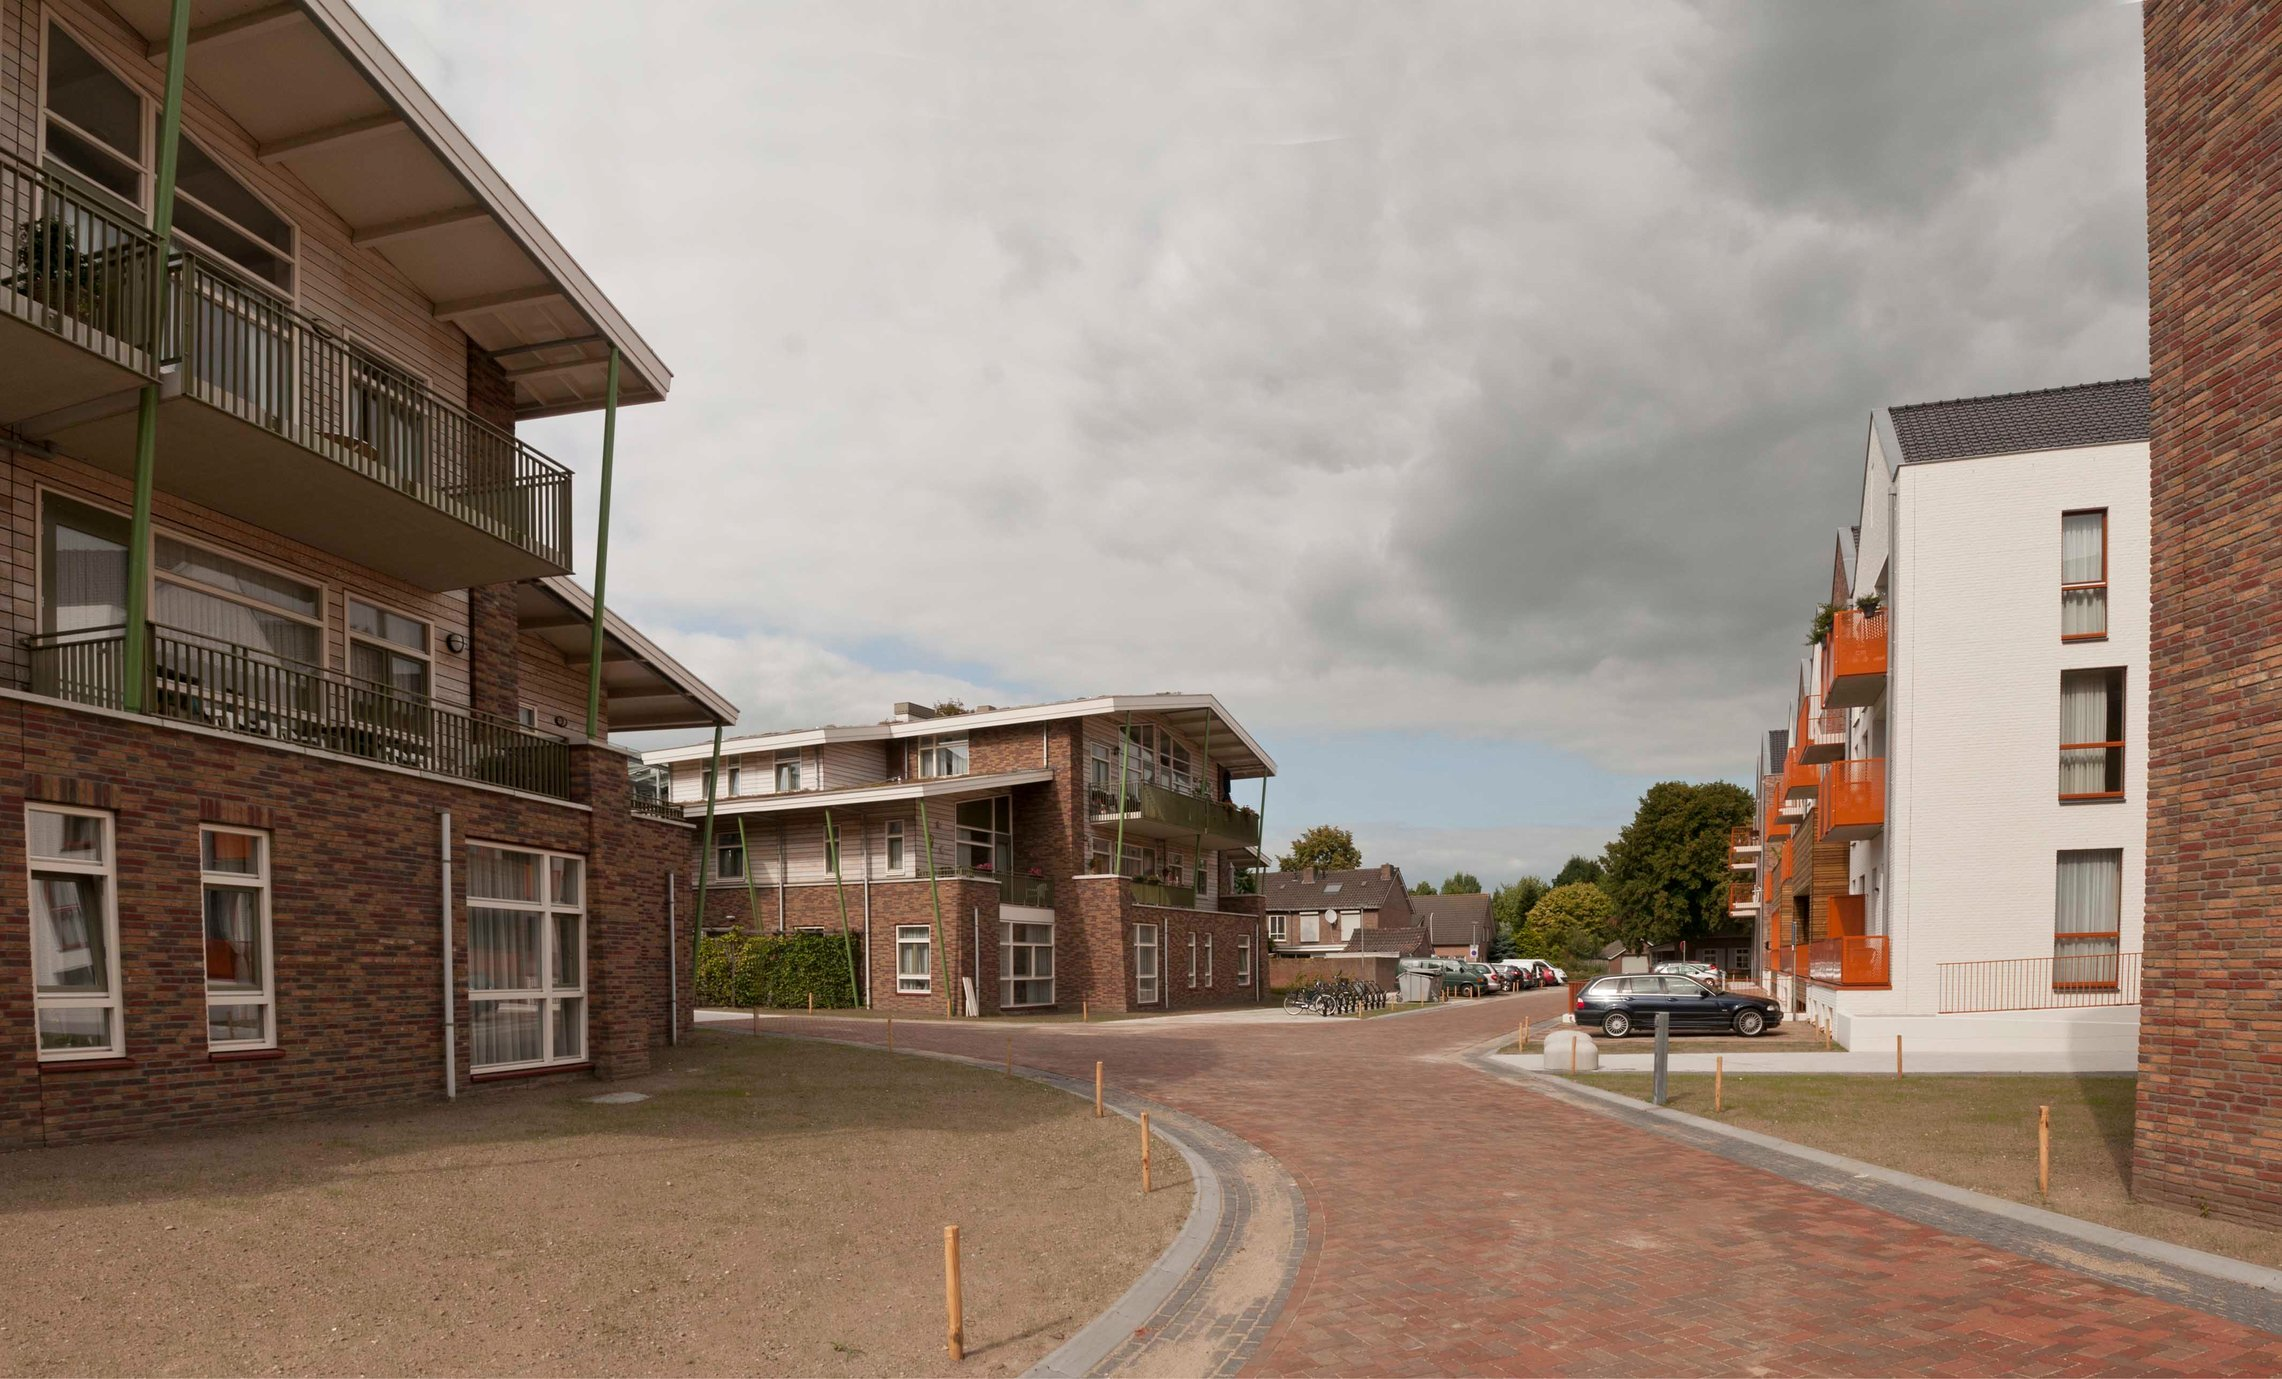 Liessel-9712 Panorama.jpg